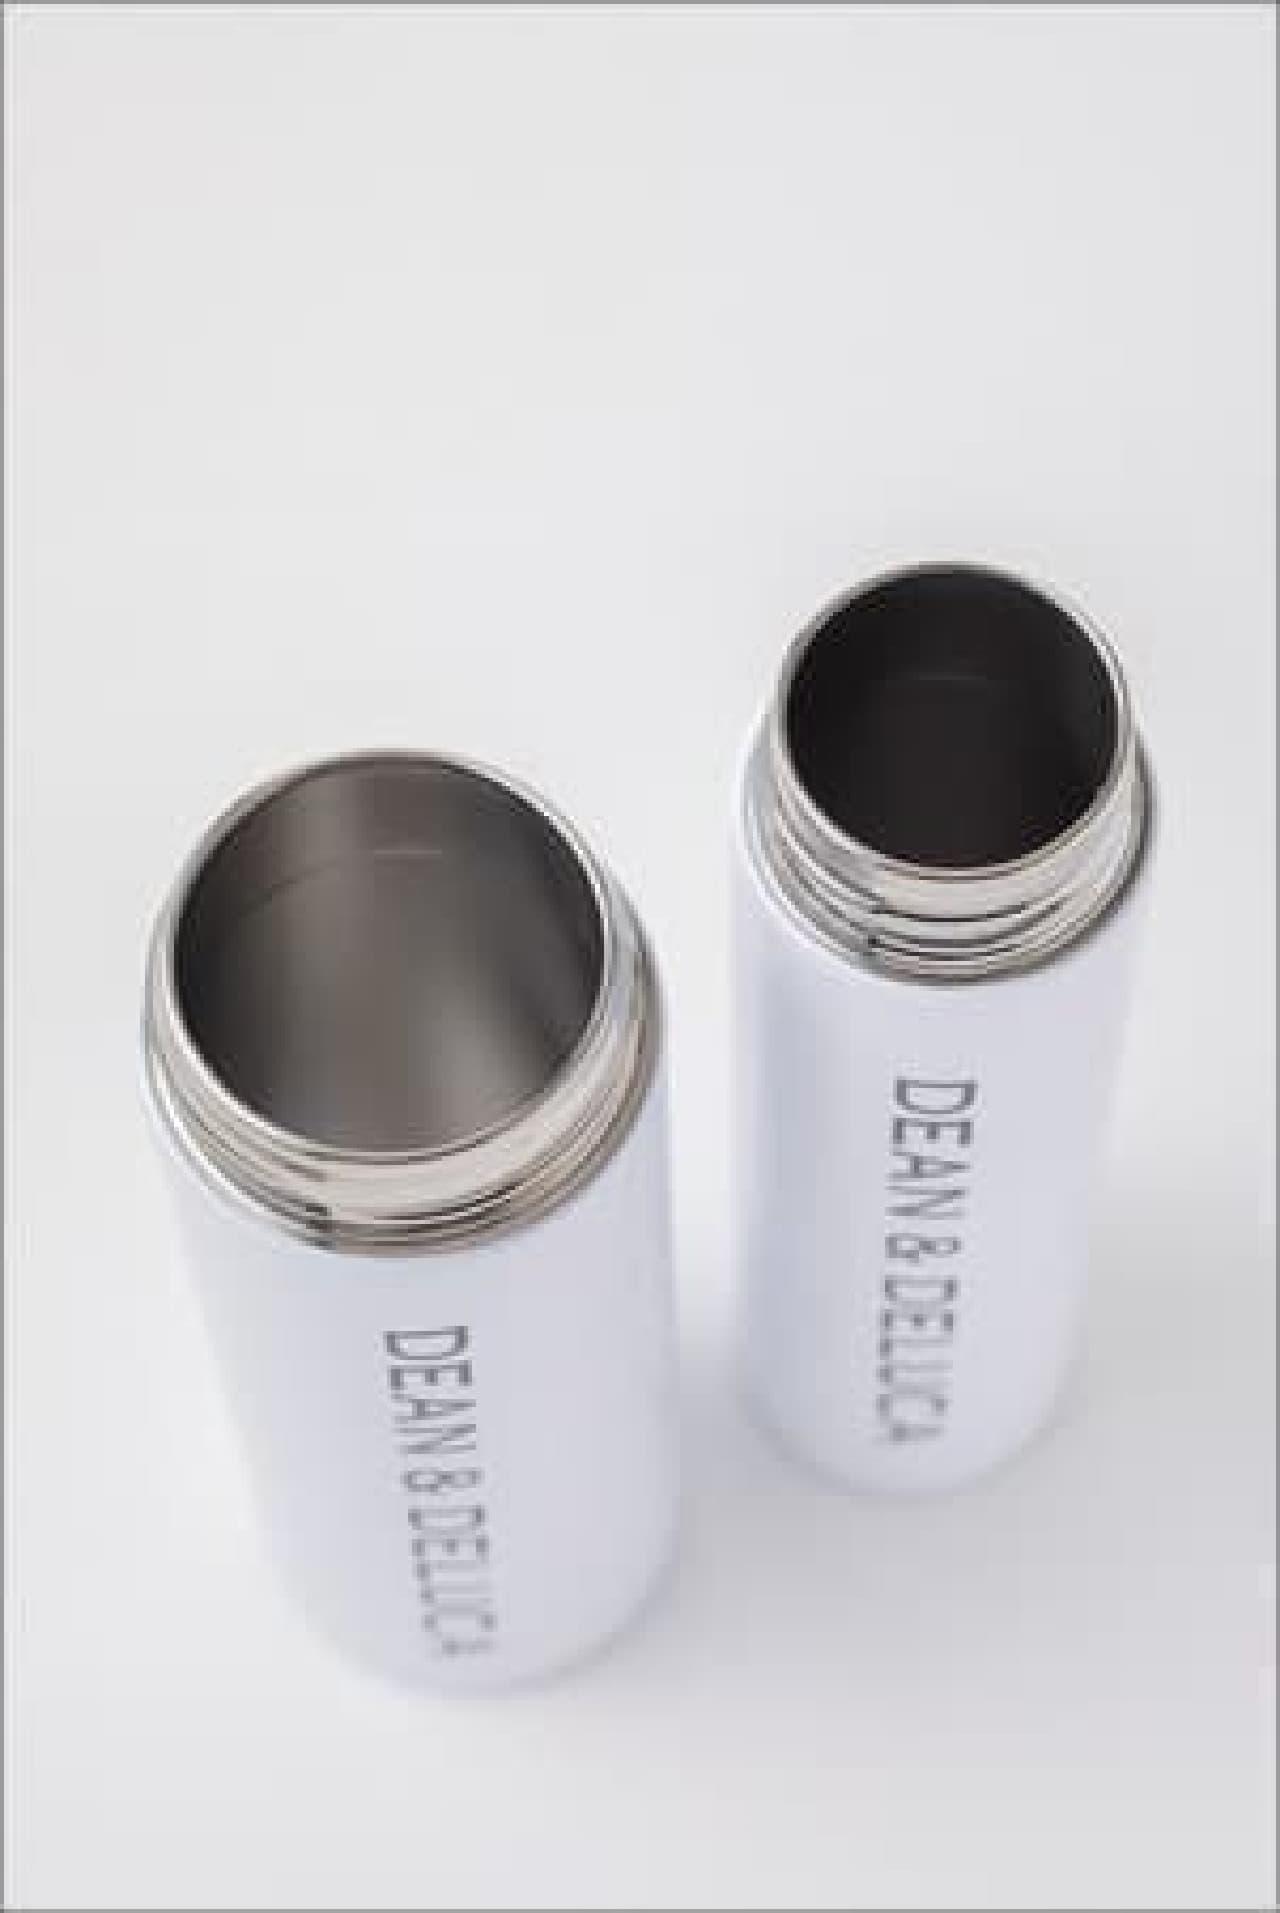 DEAN & DELUCAの「レジかご買物バッグ+ストラップ付き保冷ボトルケース」